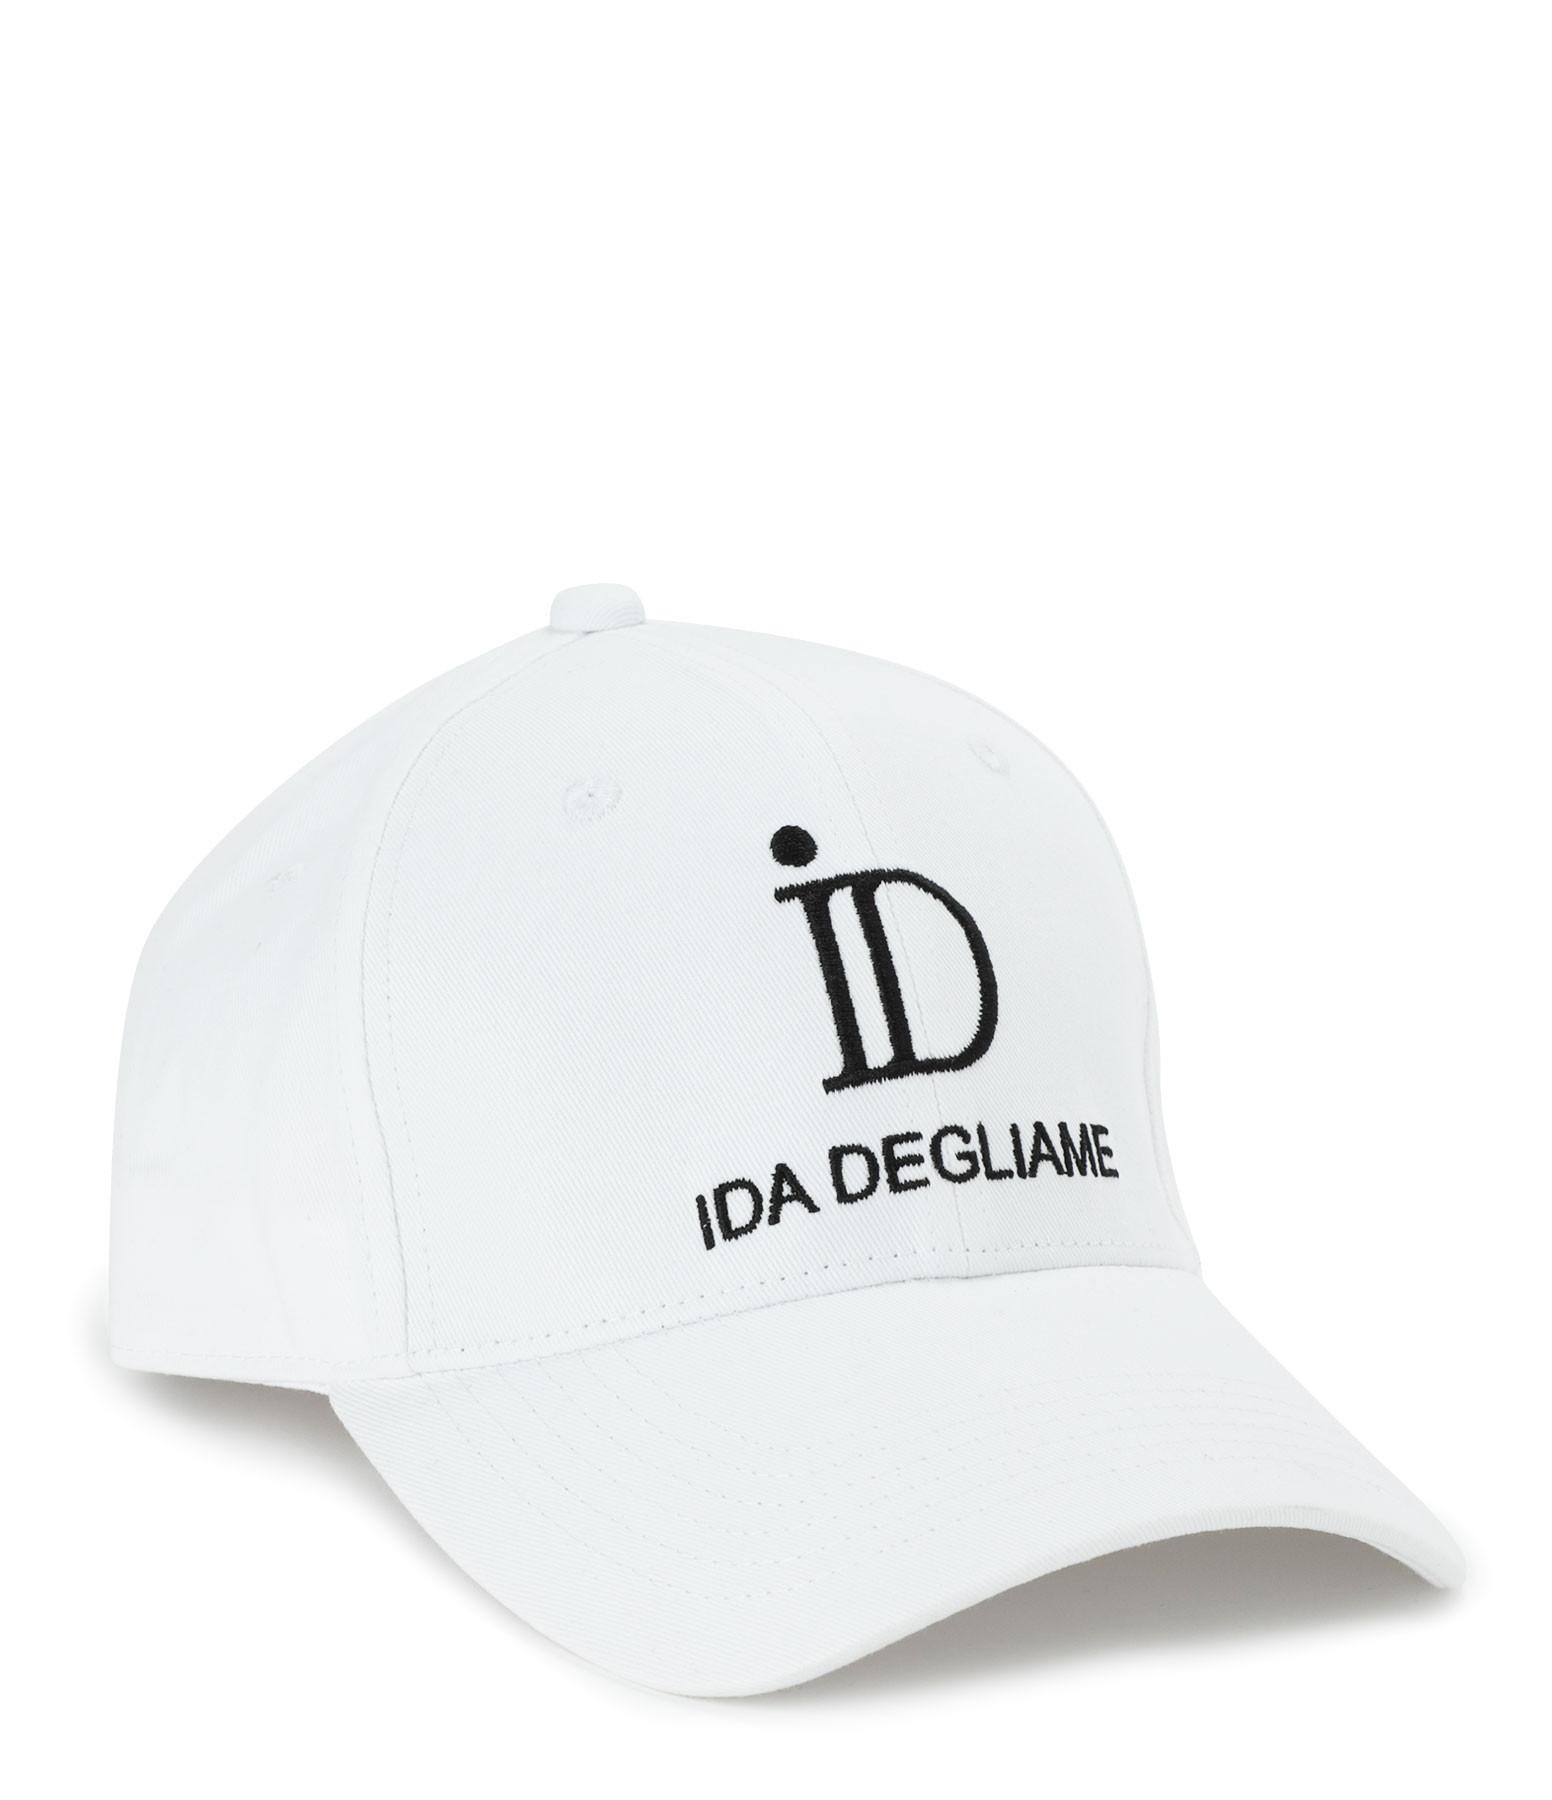 IDA DEGLIAME - Casquette ID Noir Blanc